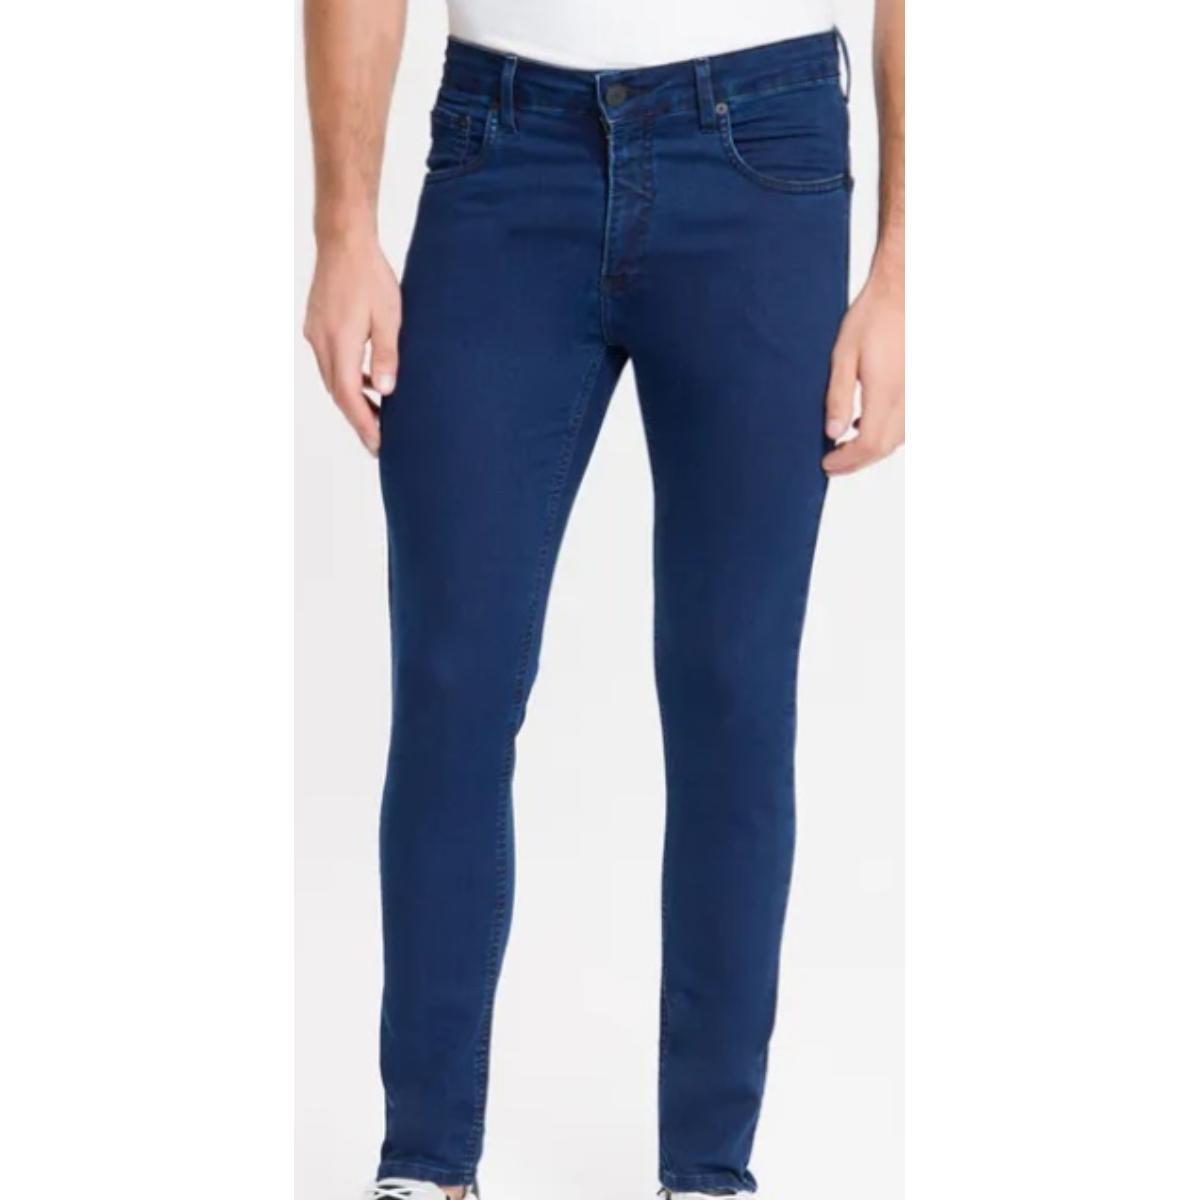 Calça Masculina Calvin Klein Cm0oc11dj002 Marinho